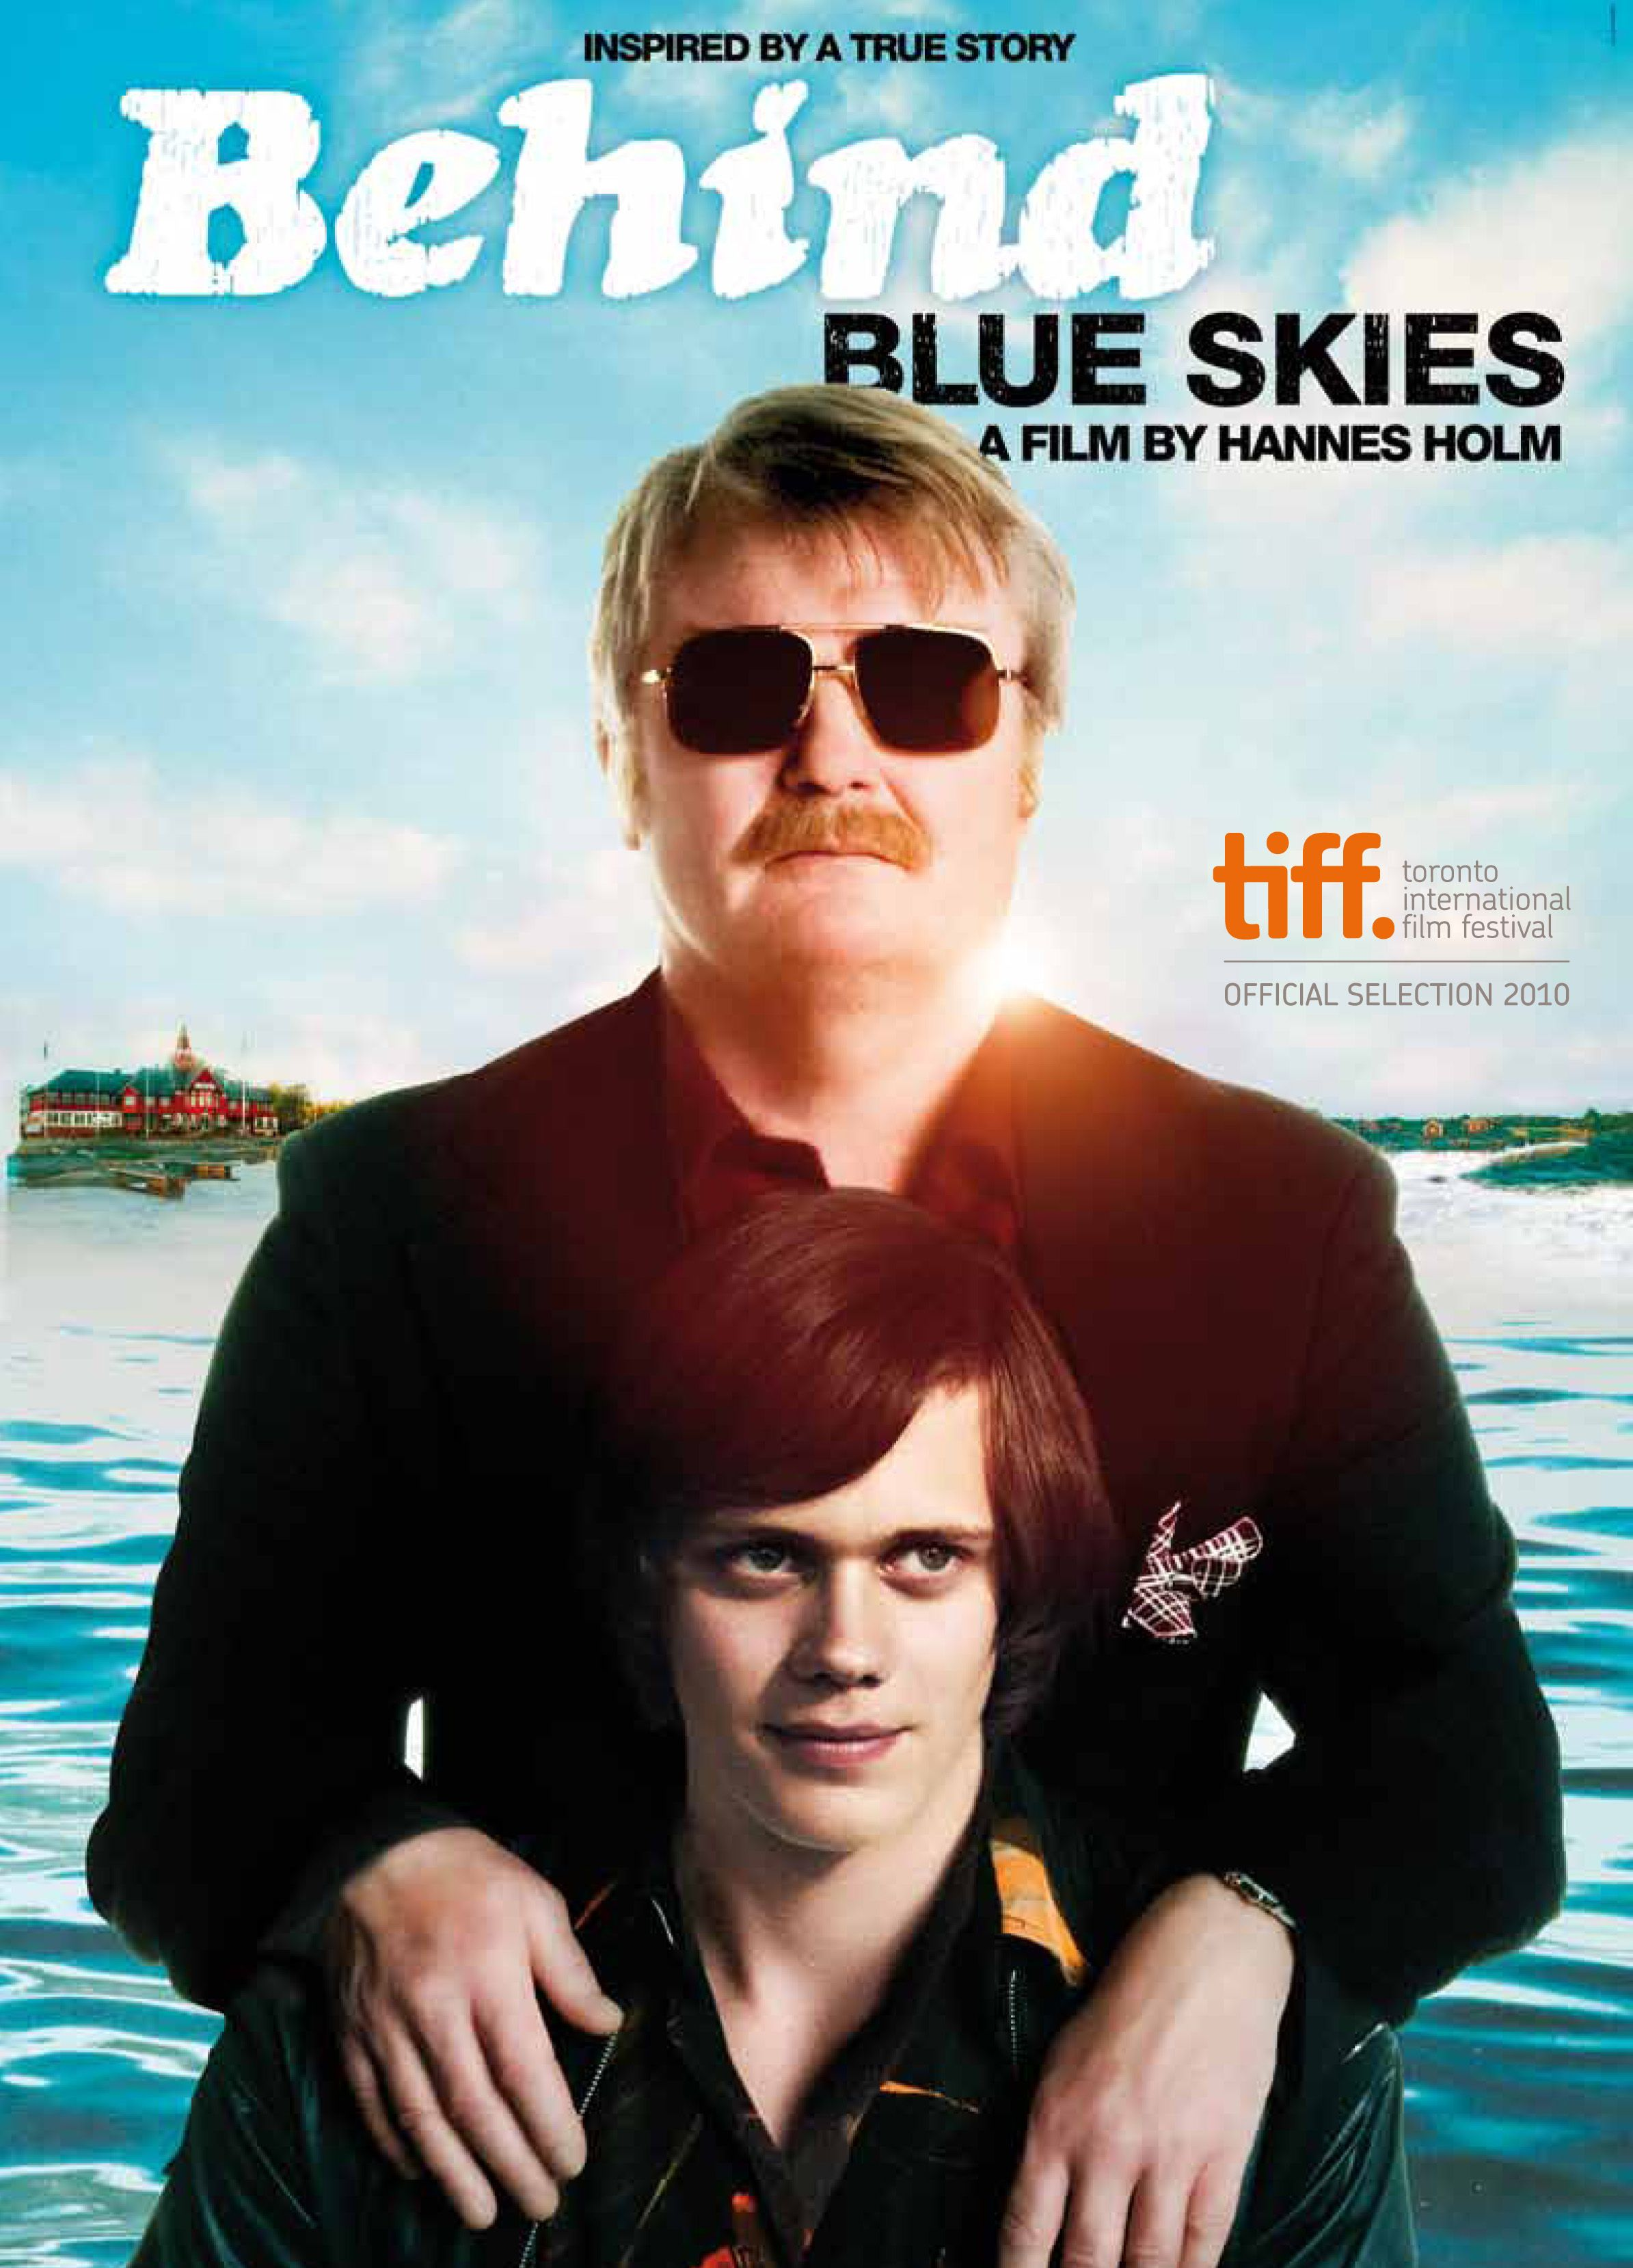 Himlen är oskyldigt blå (2010) / AvaxHome